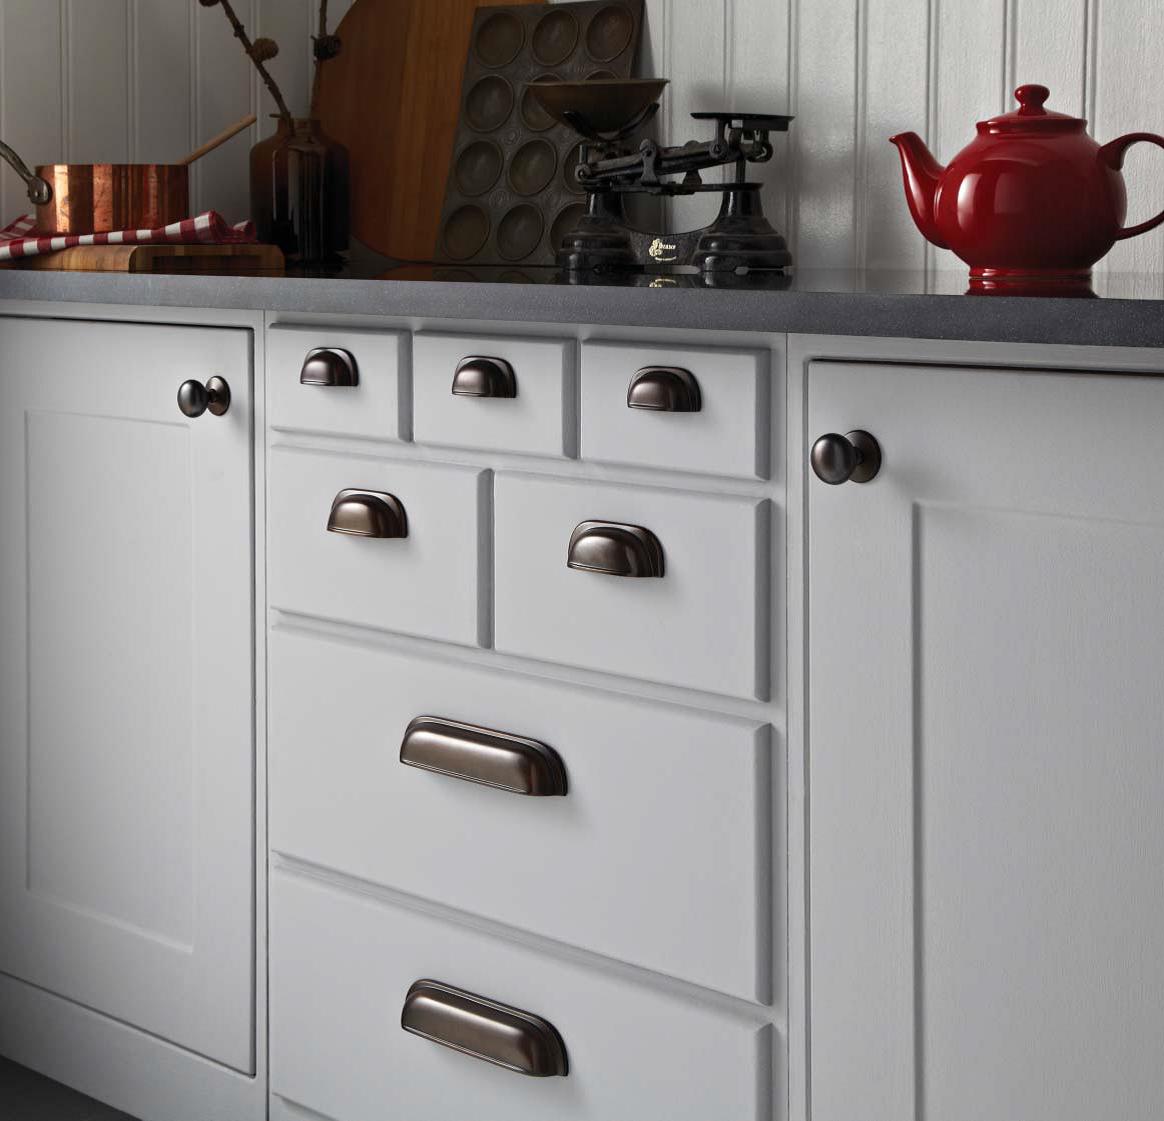 Timeless Classic Kitchen Cupboard Door Handles In Rubbed